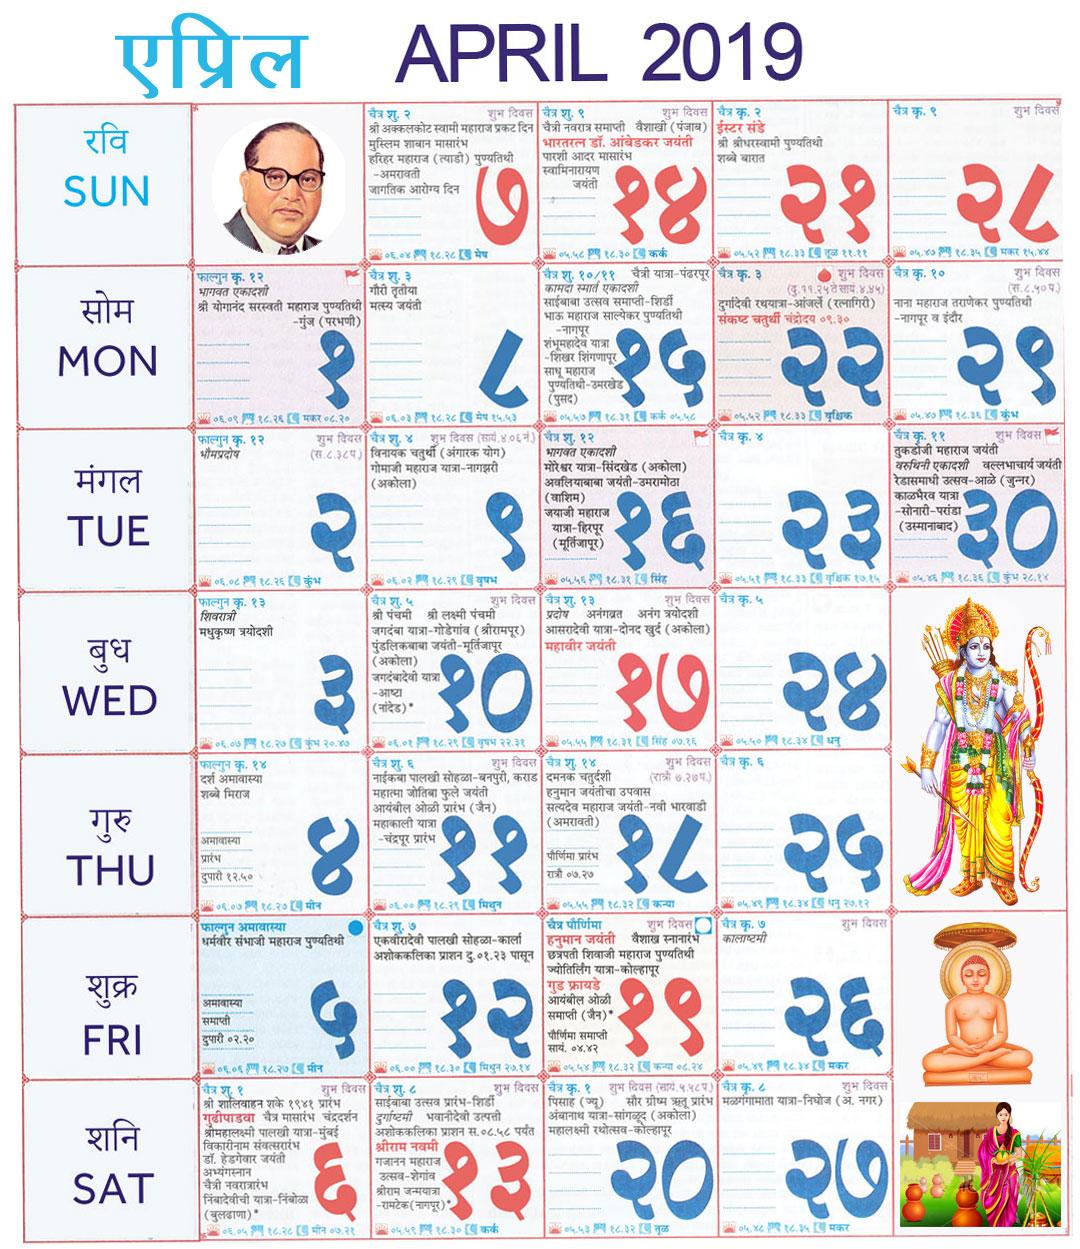 Marathi Calendar April 2019